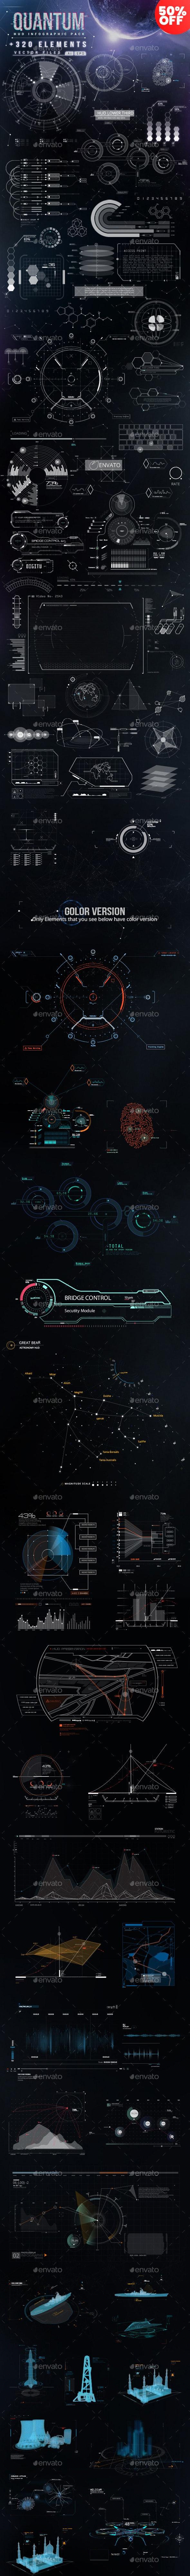 Quantum - HiTech HUD Creator Kit - Infographics